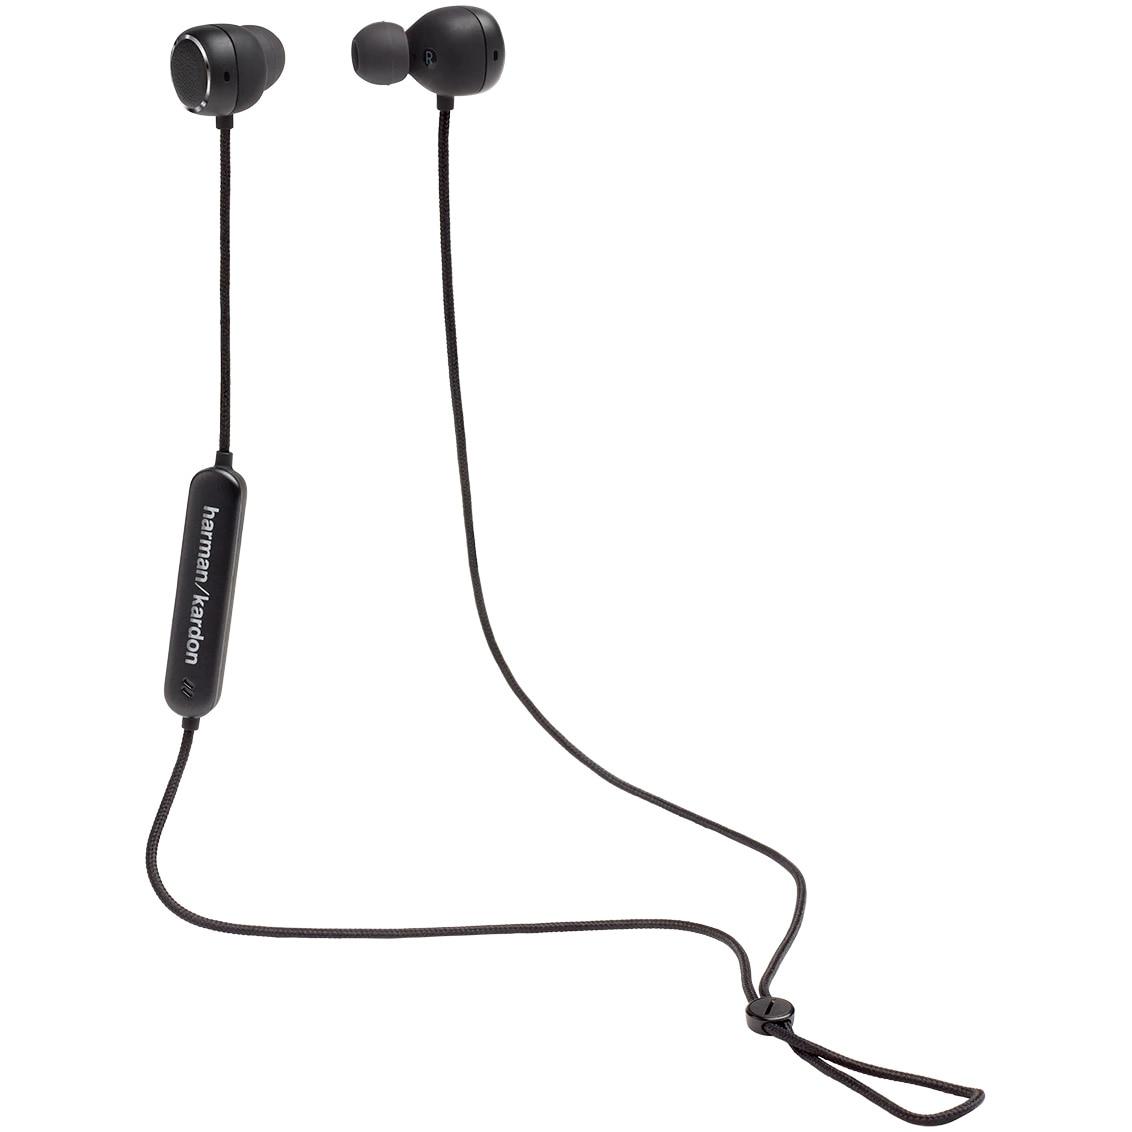 Fotografie Casti Audio In Ear Harman Kardon Fly, Wireless, Bluetooth, Microfon, Autonomie 8 ore, Negru